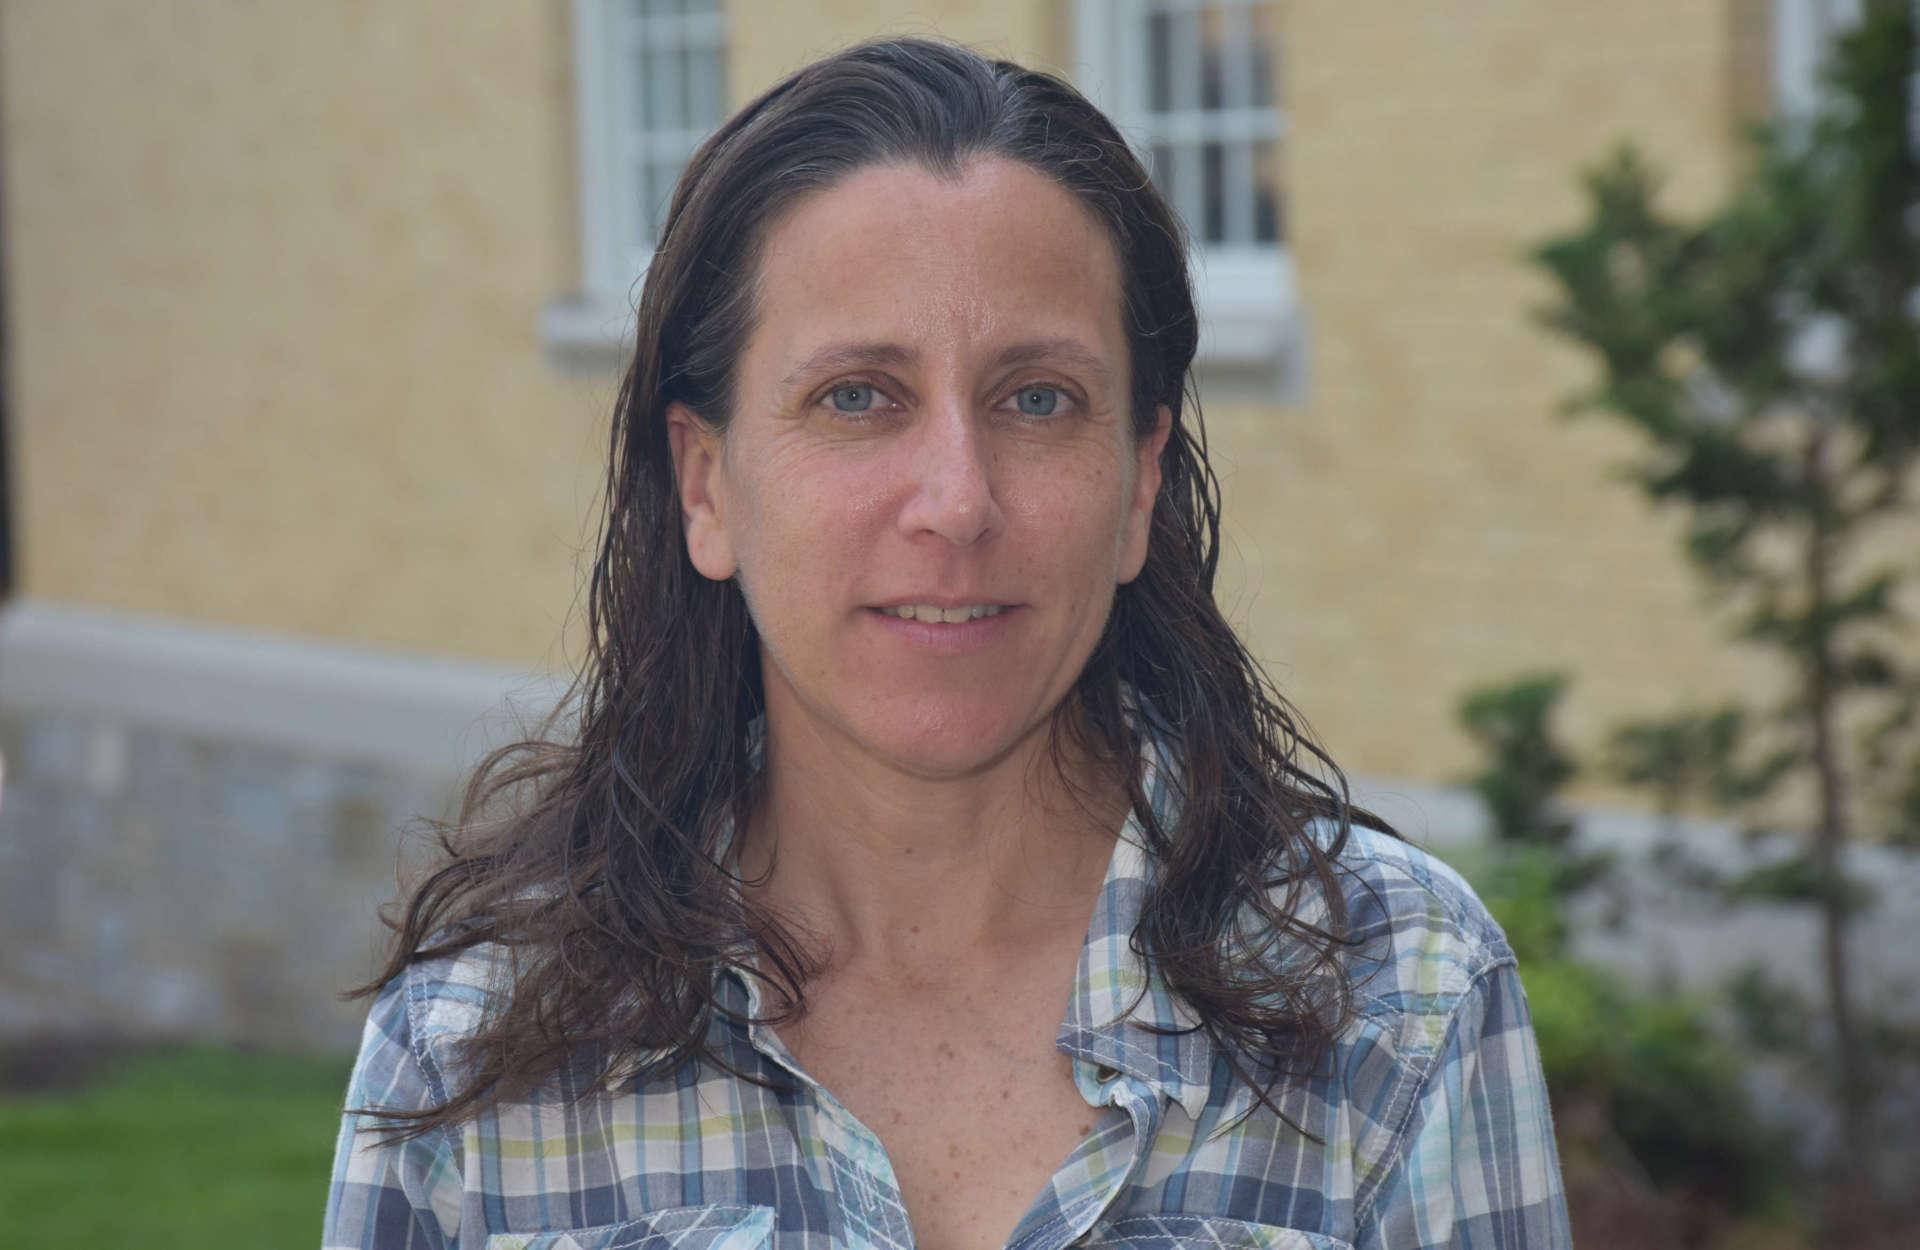 Dr. Cecilia Melton, assistant professor of environmental studies